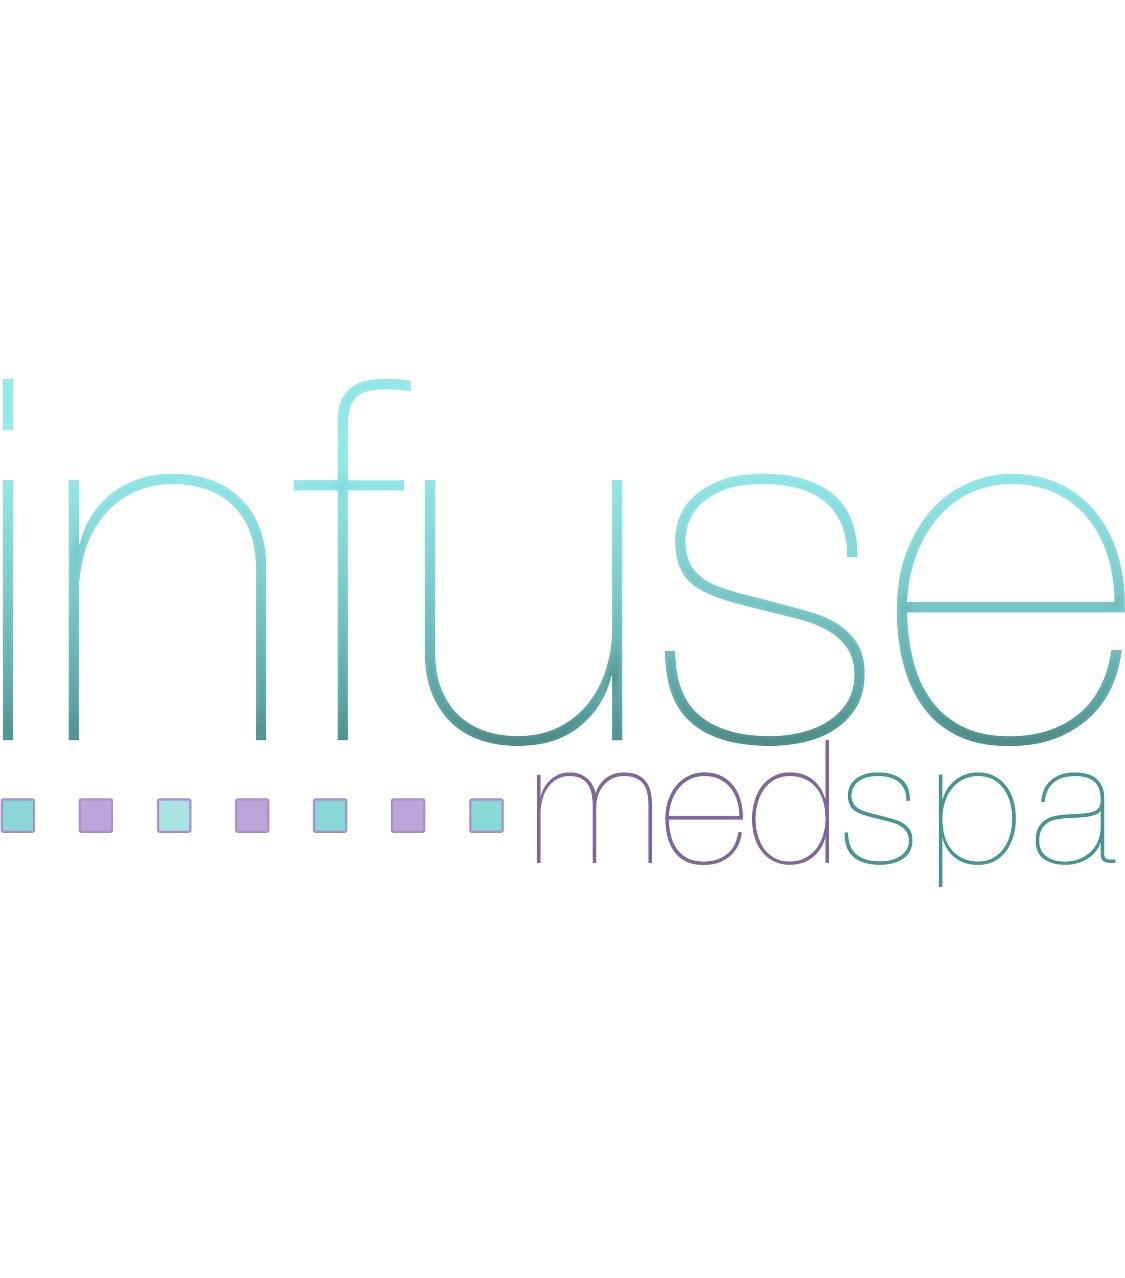 InfuseMedSpa InstaSize.JPG